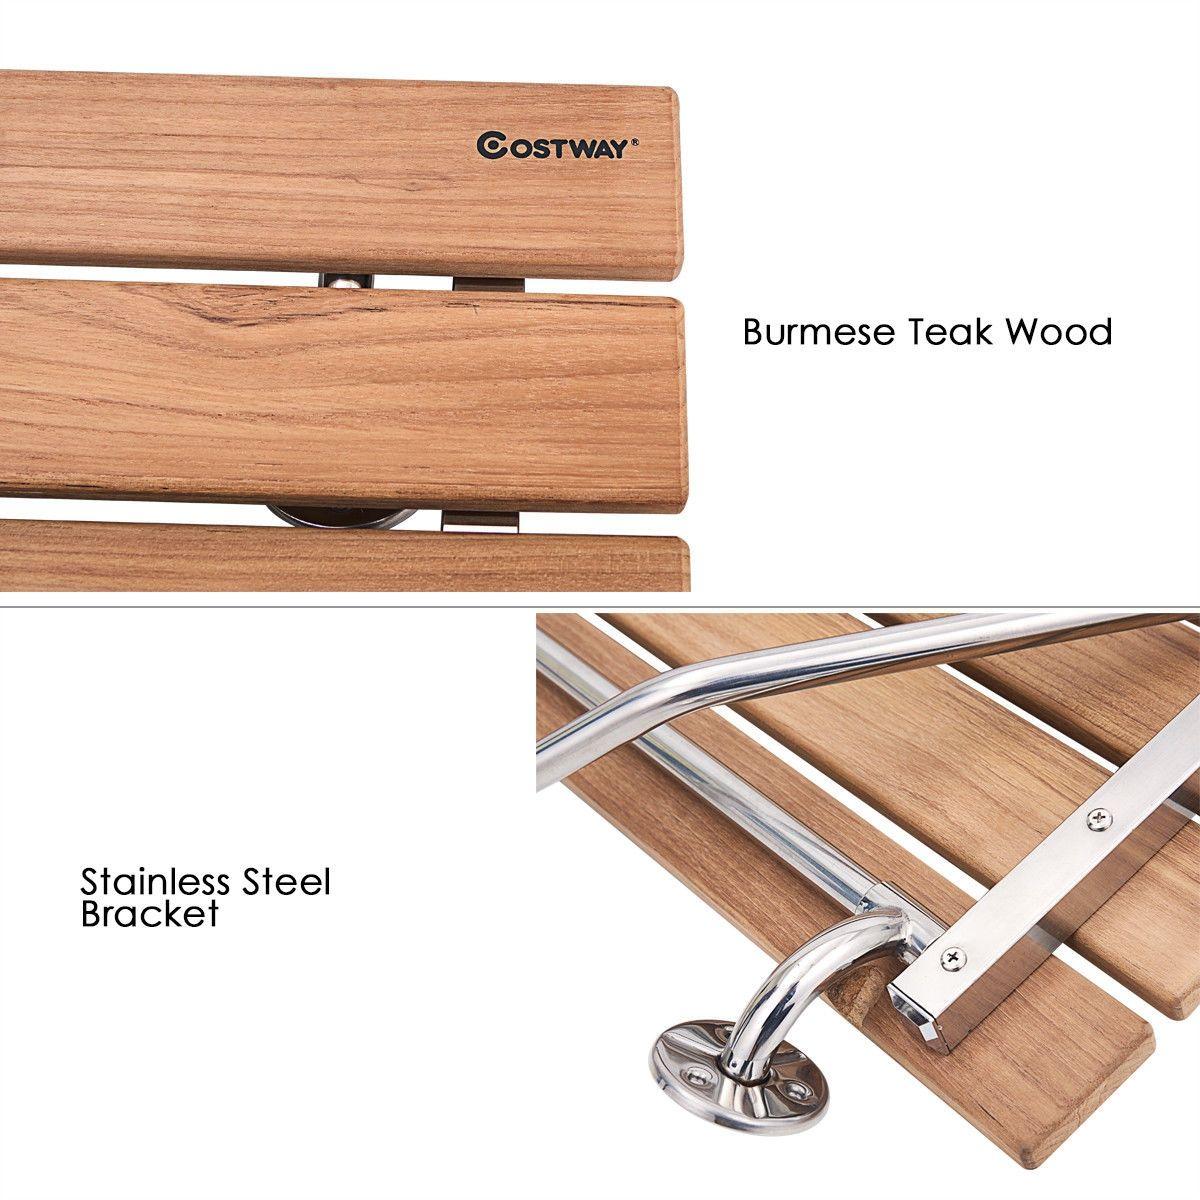 35 5 Wall Mounted Teak Wooden Folding Shower Seat Bathroom Stool In 2020 Shower Seat Bathroom Stool Wood Shower Bench